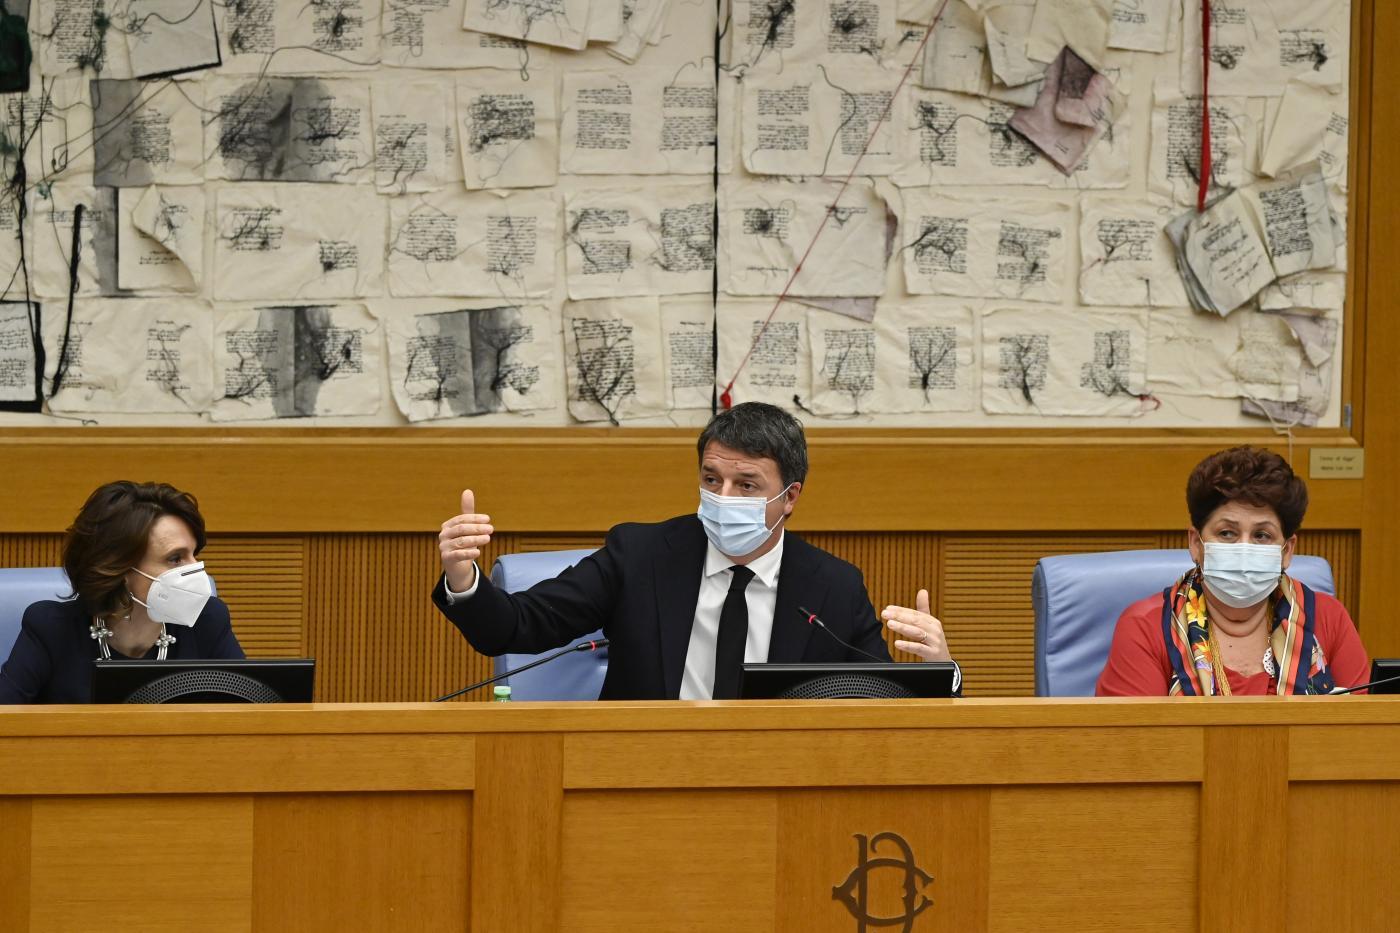 Matteo Renzi. Conferenza stampa con i ministri uscenti, Elena Bonetti e Teresa Bellanova